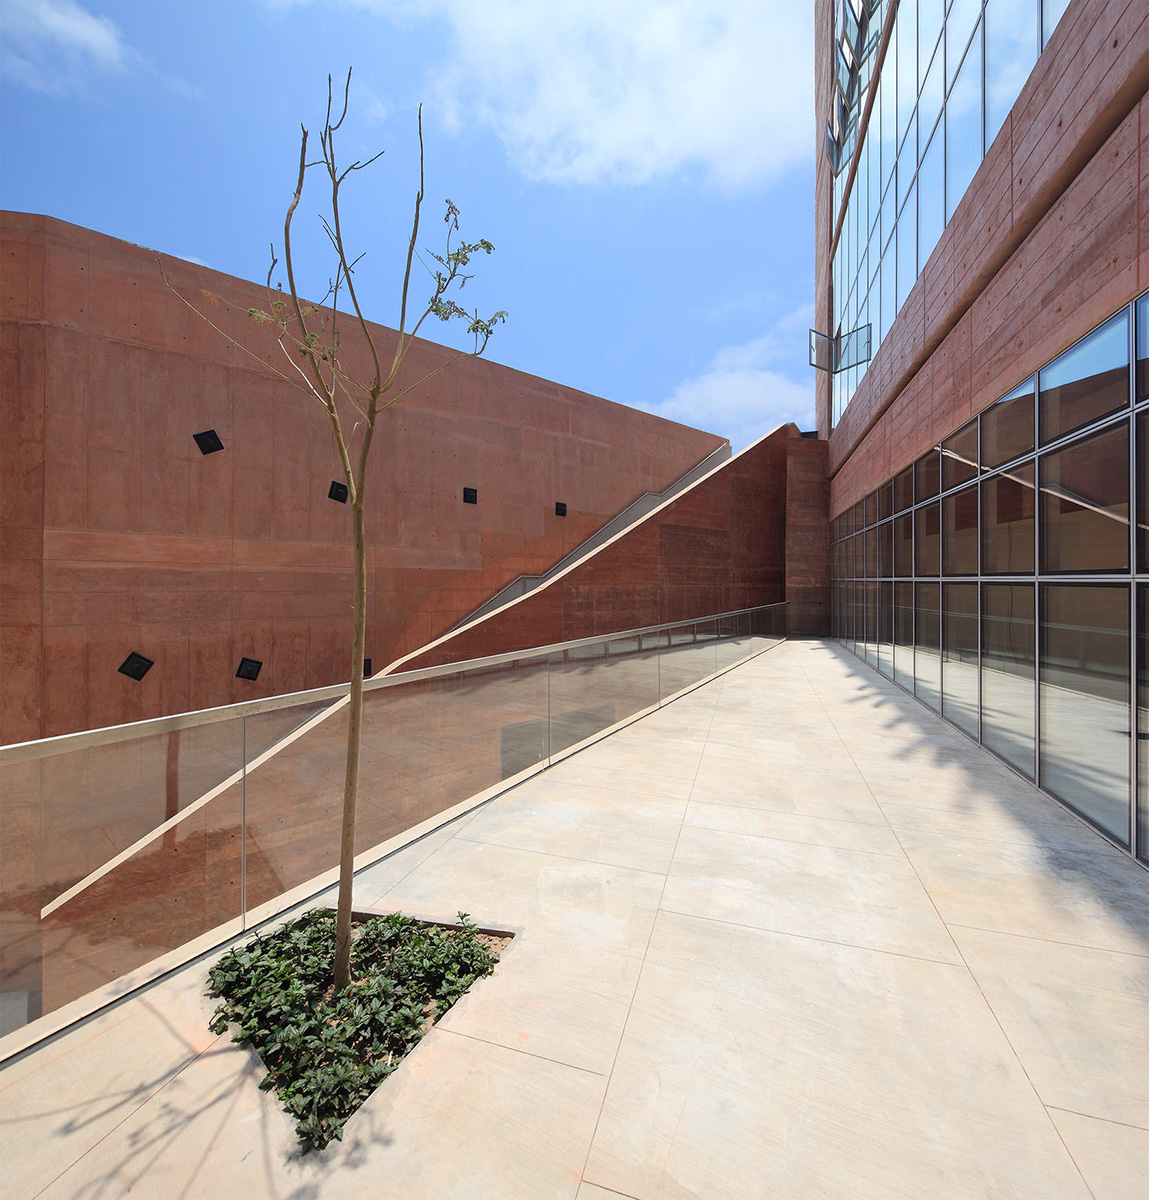 08-biblioteca-ciencias-ingenieria-arquitectura-pucp-foto-juan-solano-ojasi